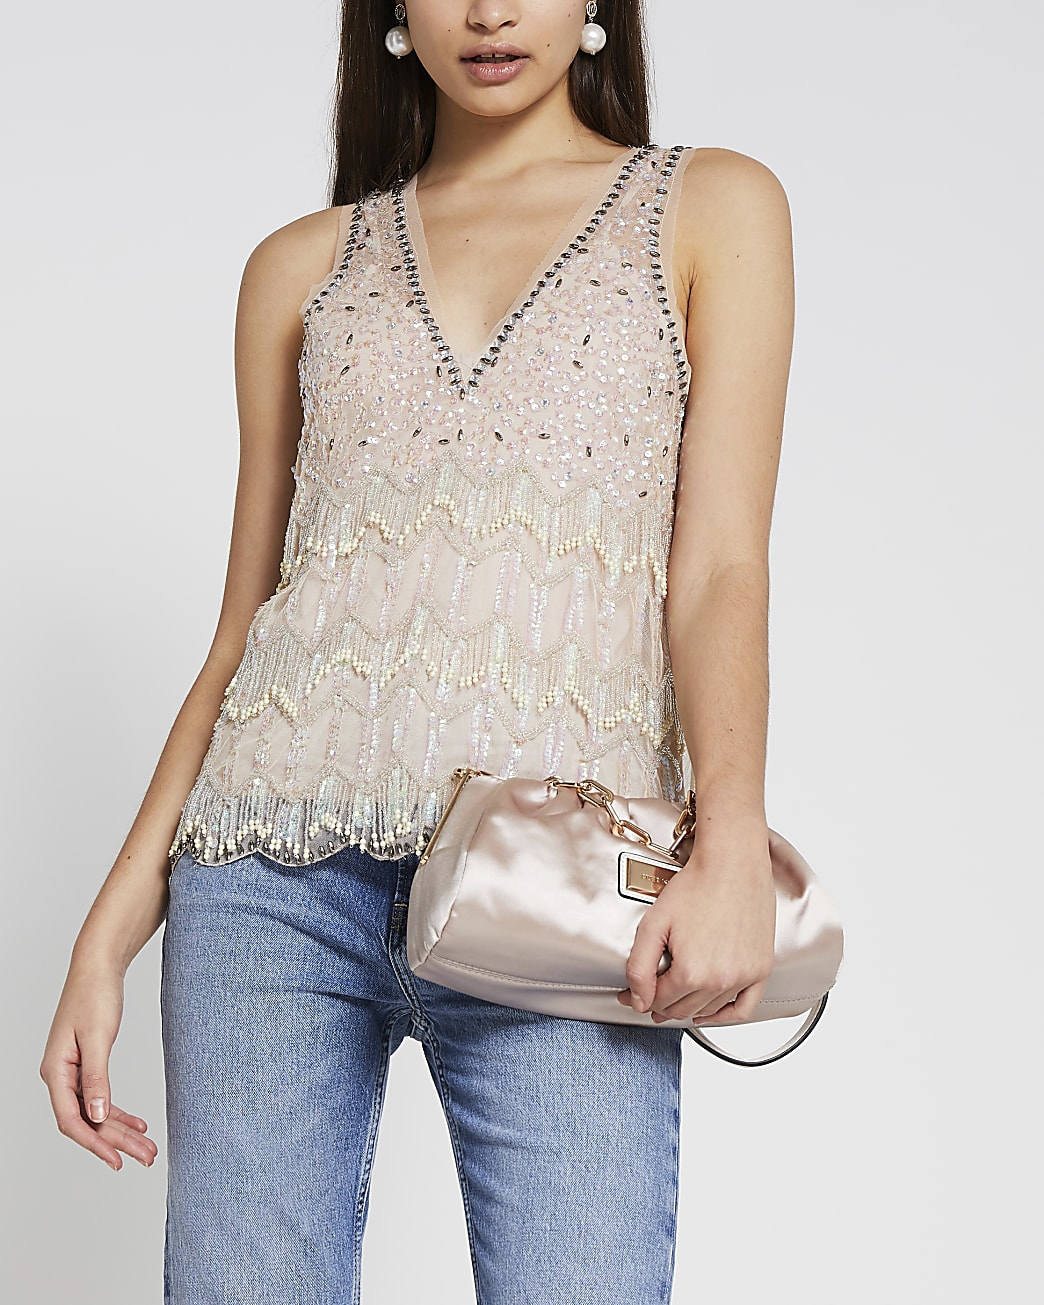 Cream sleeveless embellished vest top